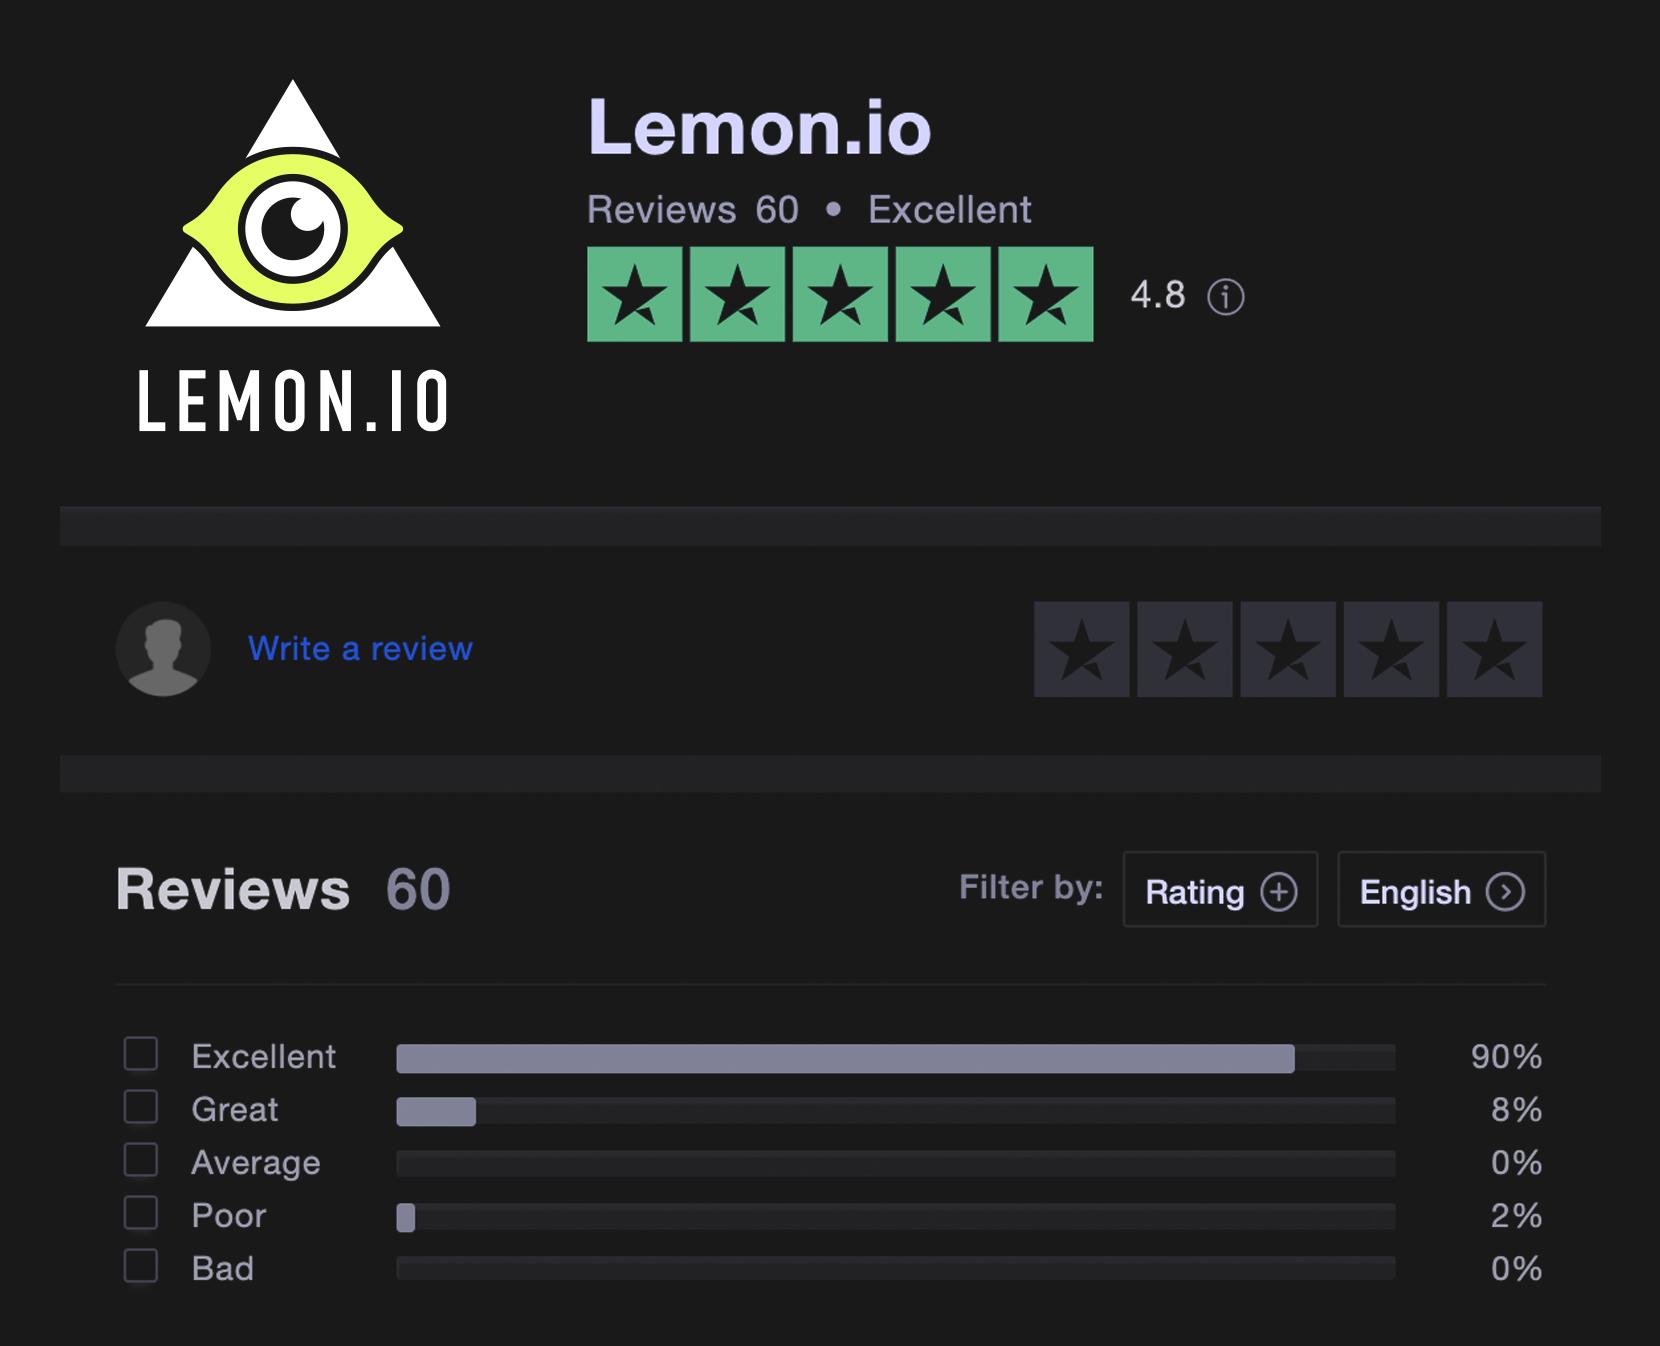 Lemon.io trustpilot review